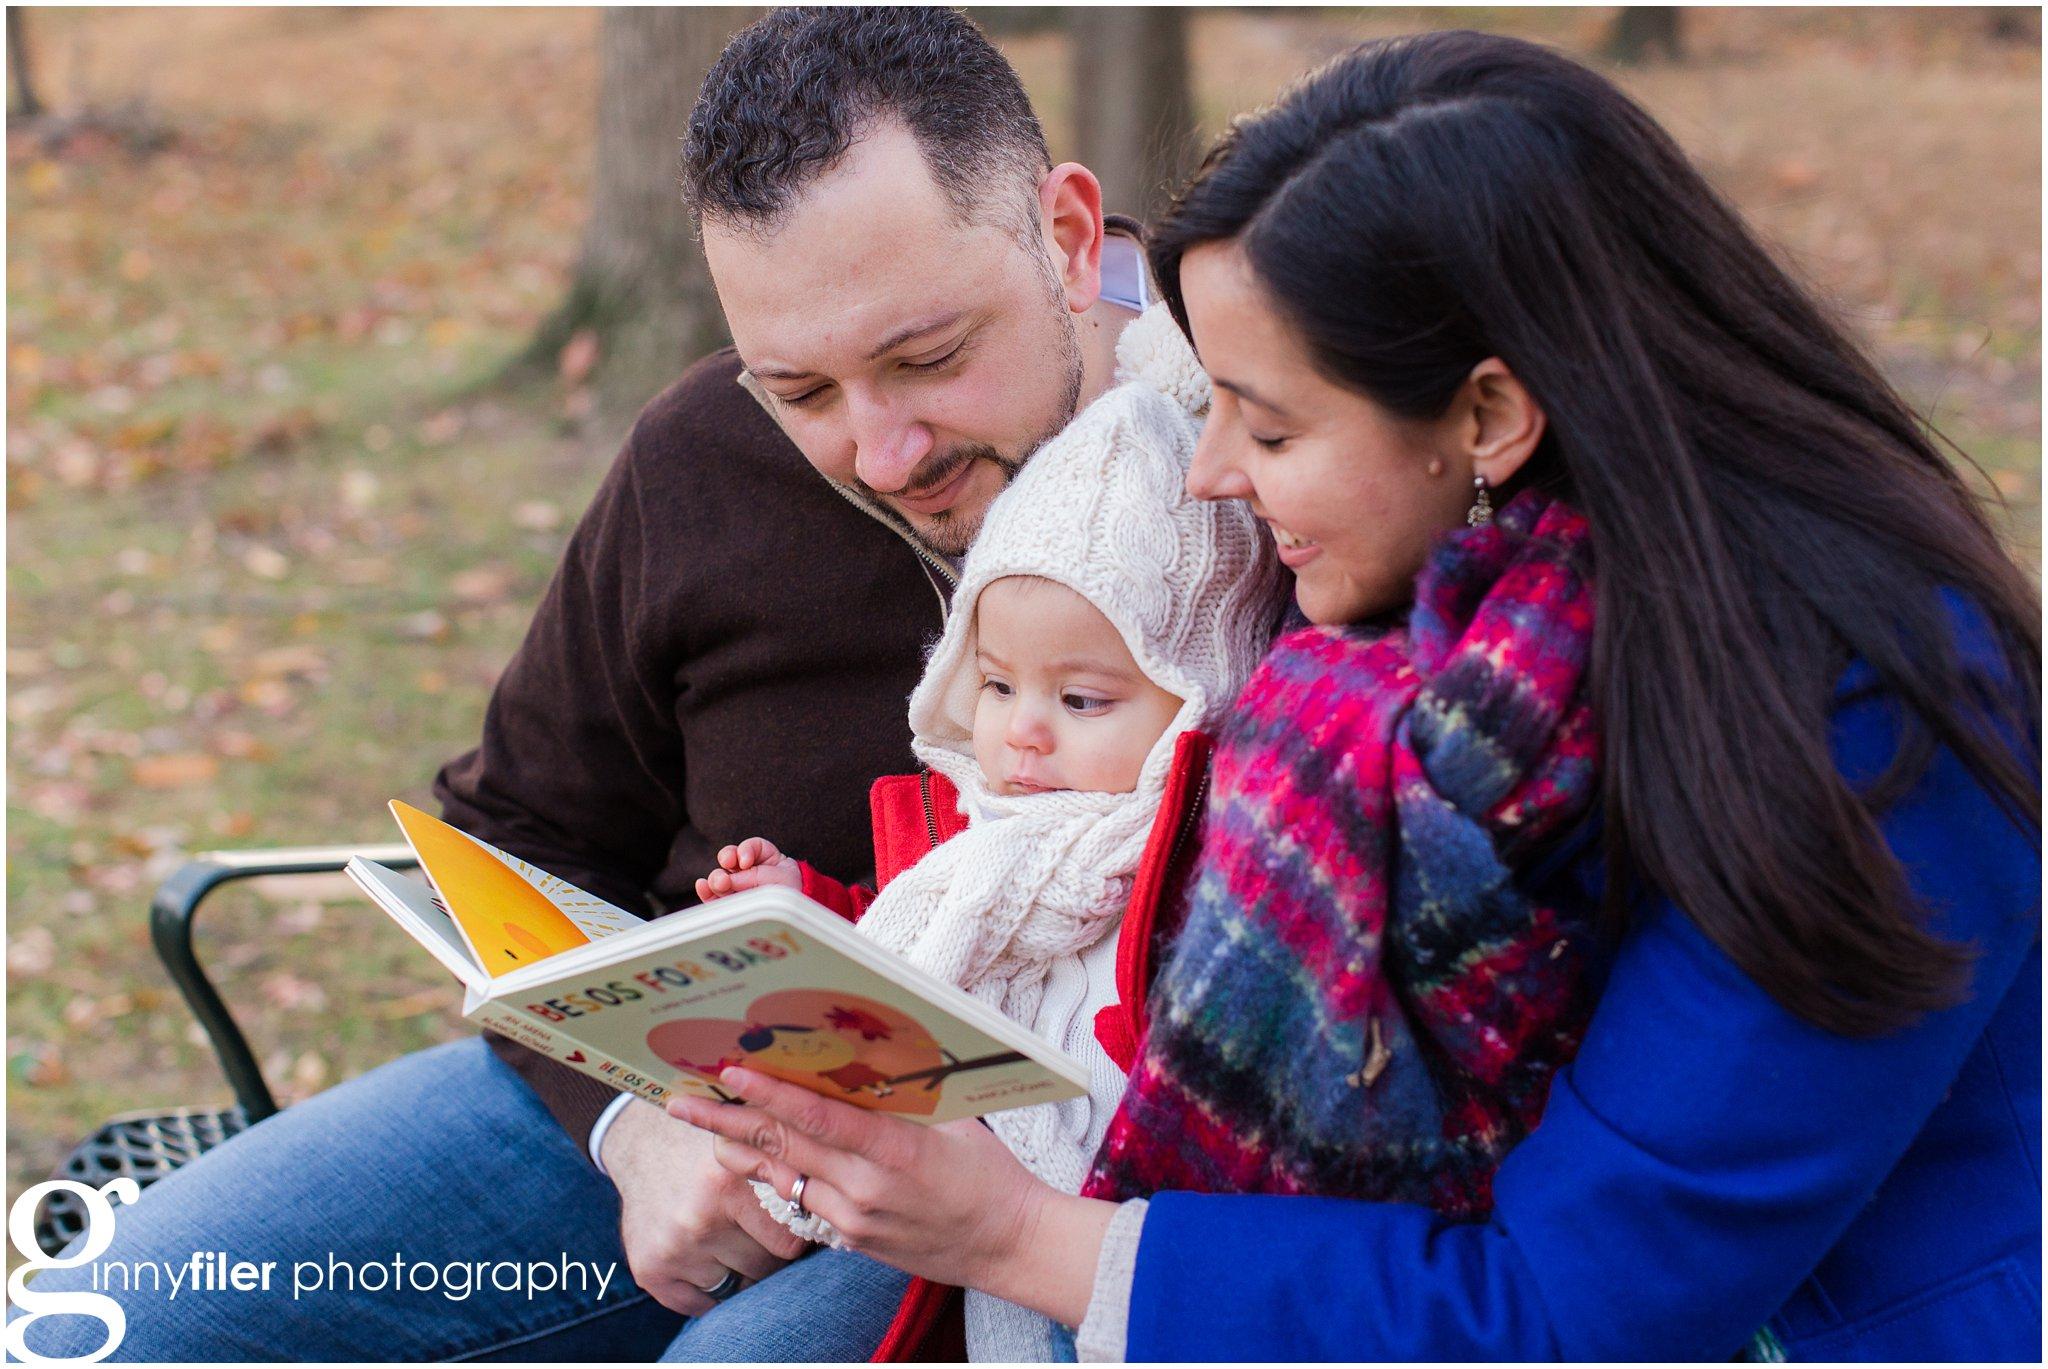 family_photography_Sanchez_0018.jpg